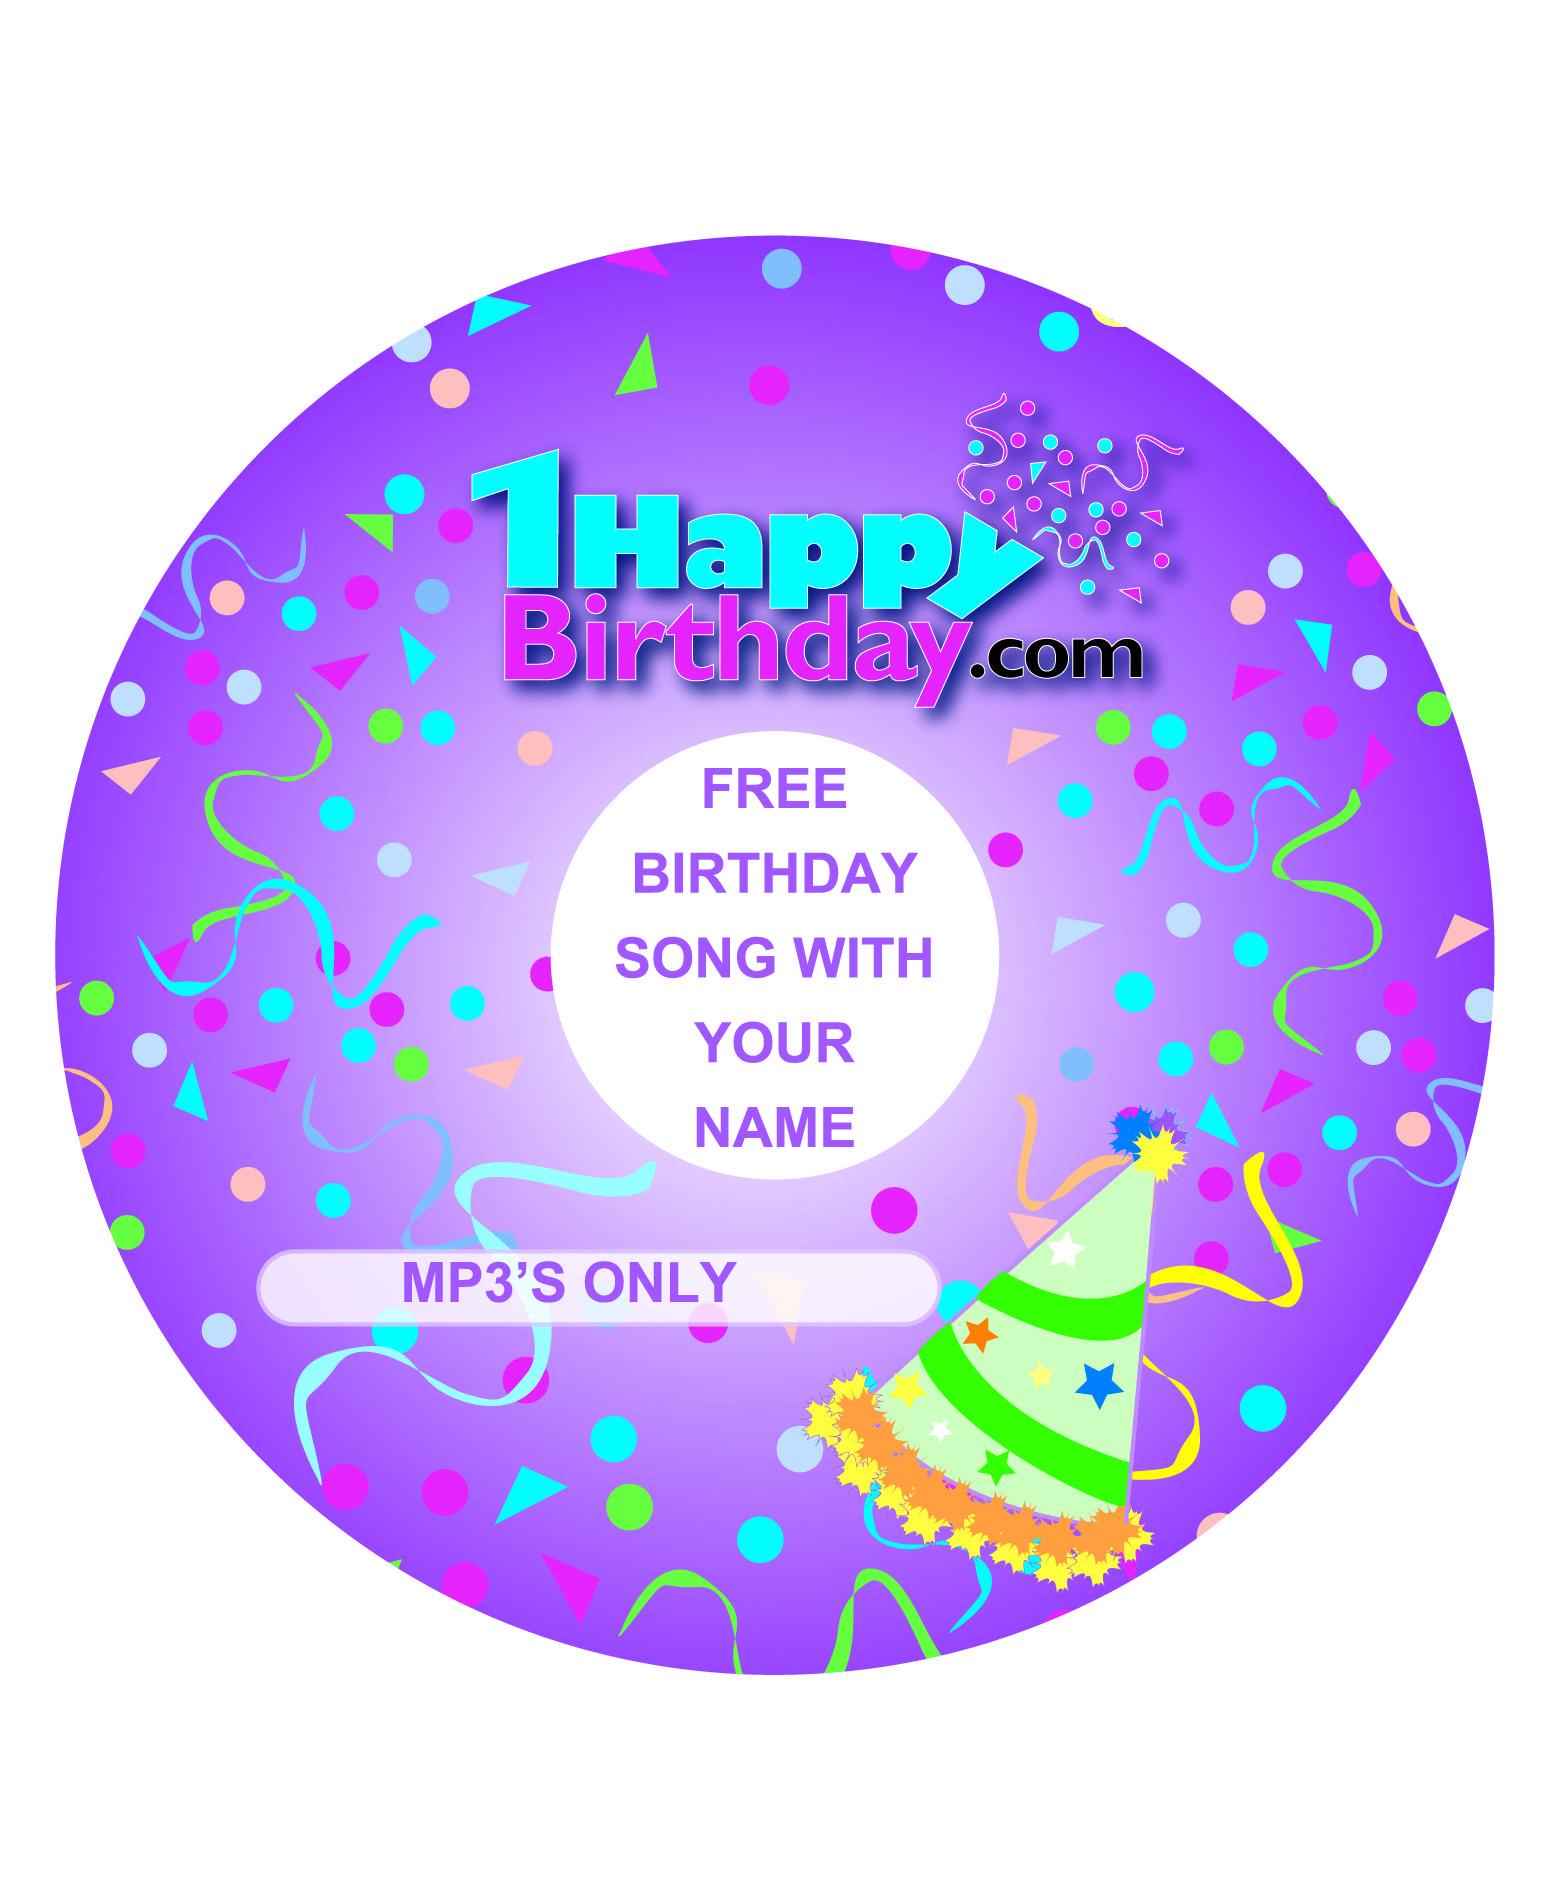 Customize & Send Funny Greeting Cards Online - JibJab